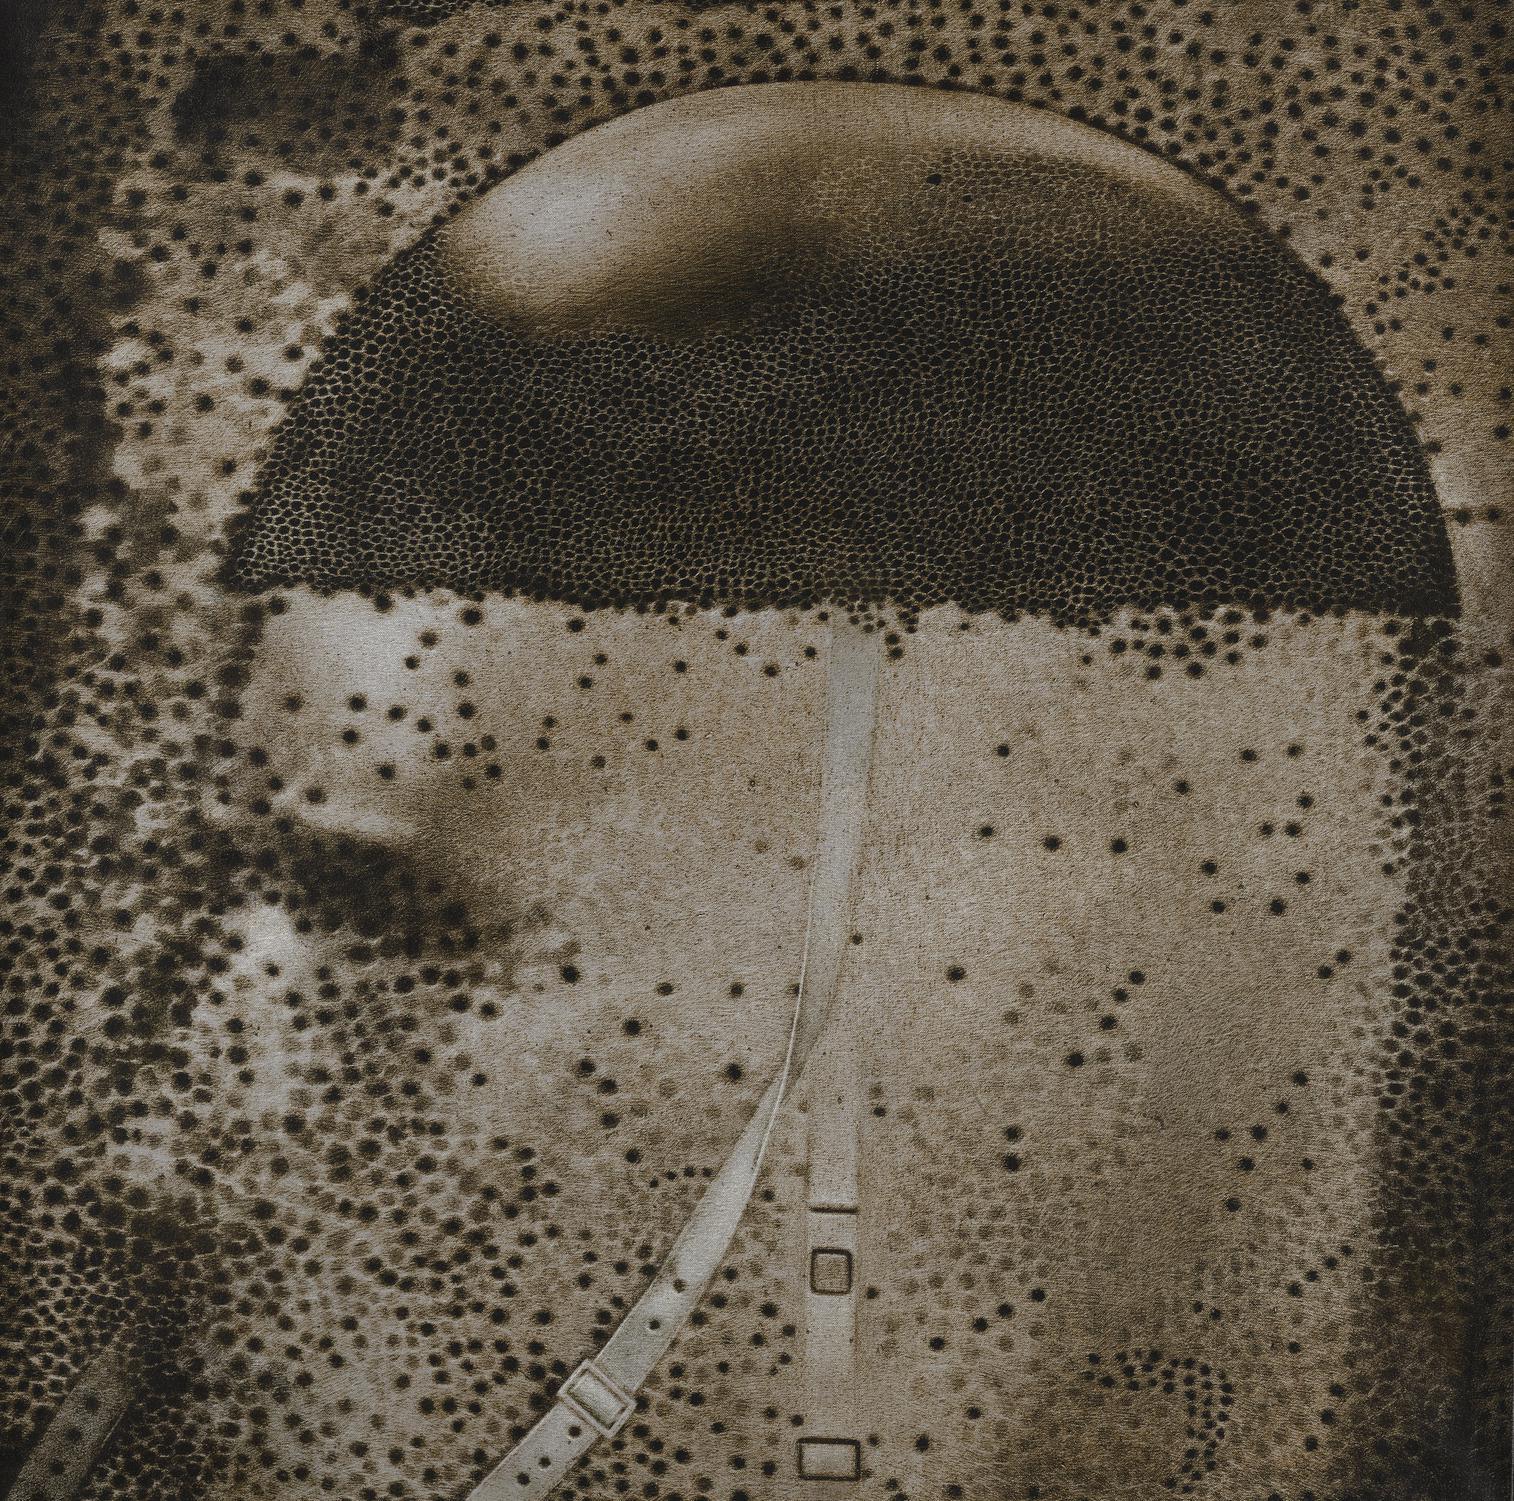 Rameshwar Broota-Helmet-2000